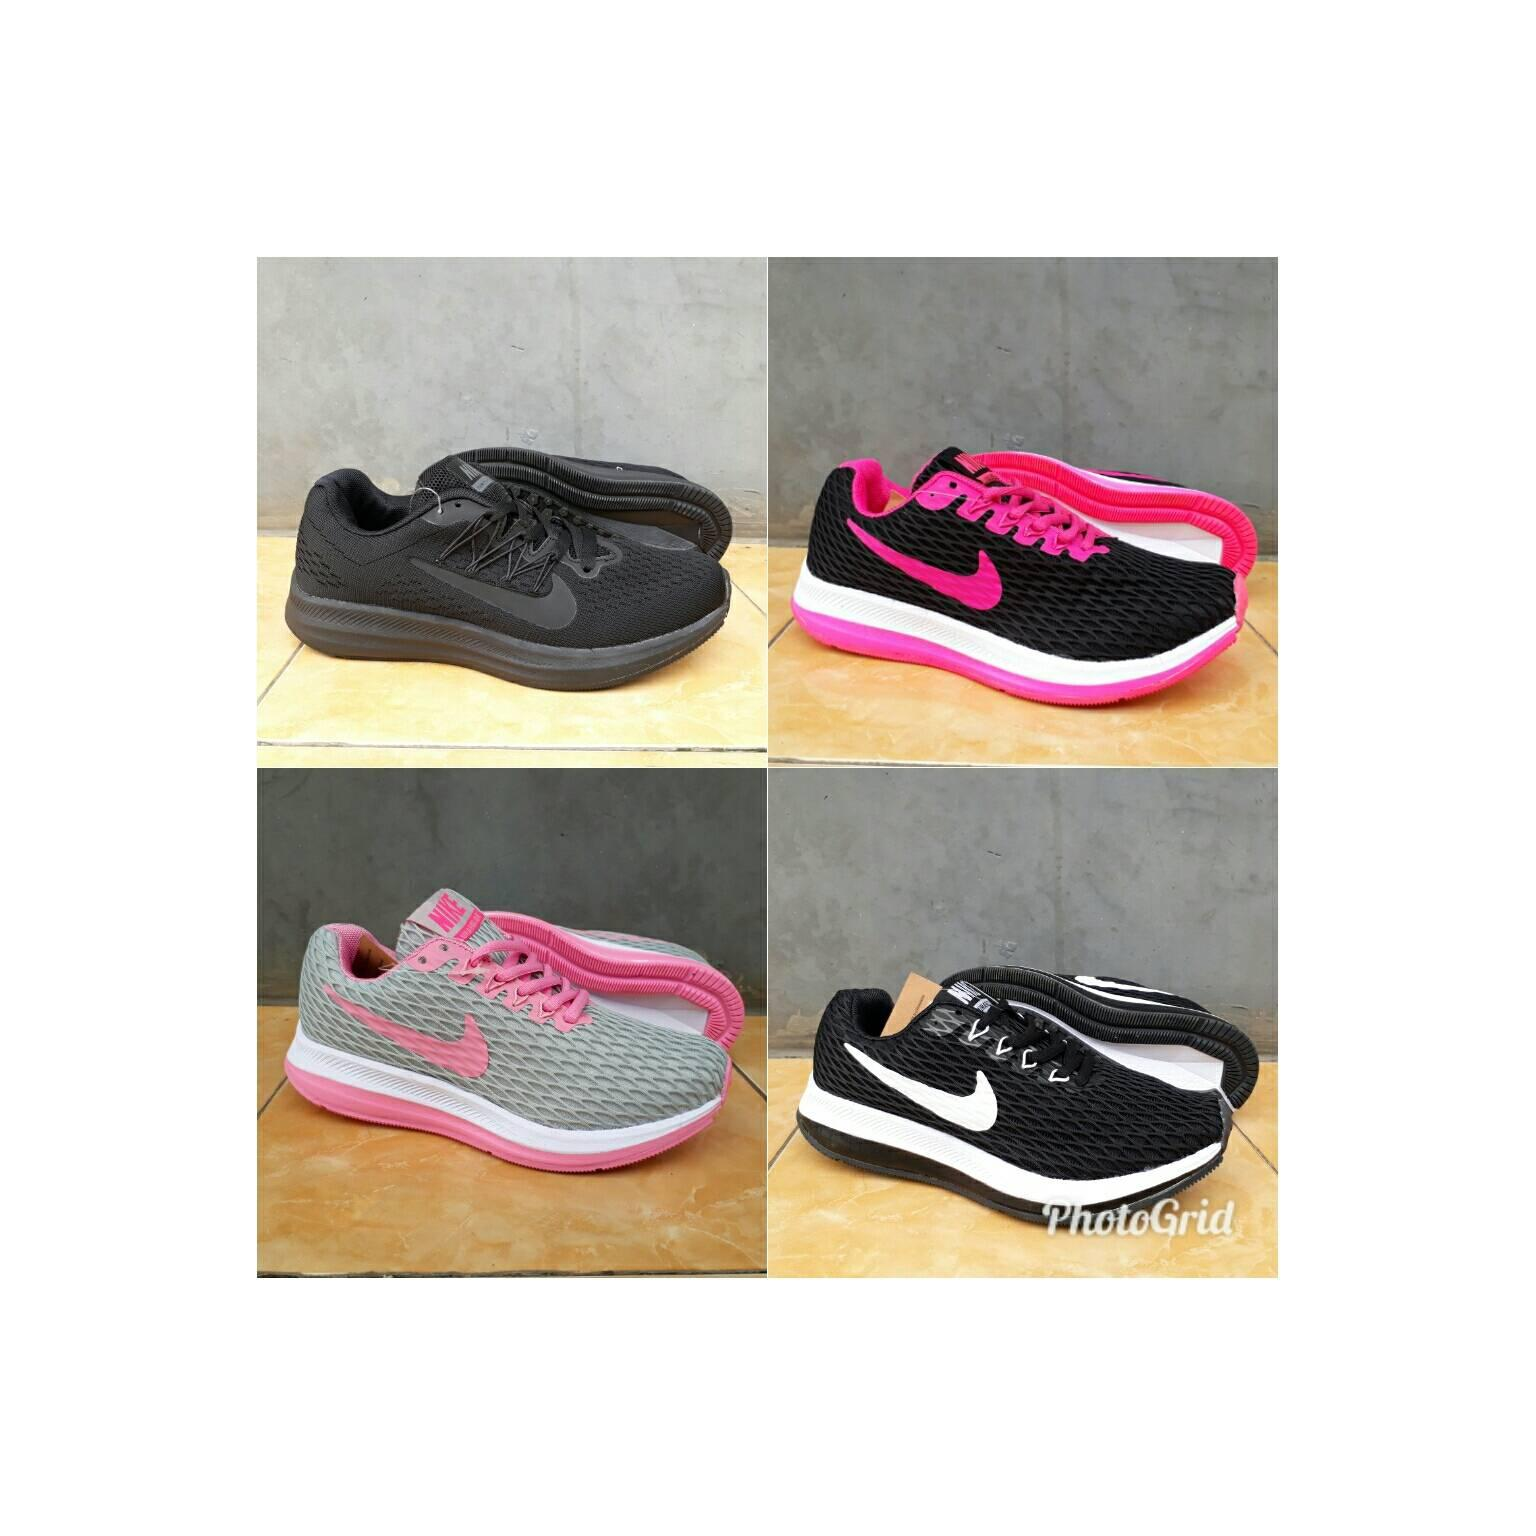 Sepatu running Nike zoom pegasus impor